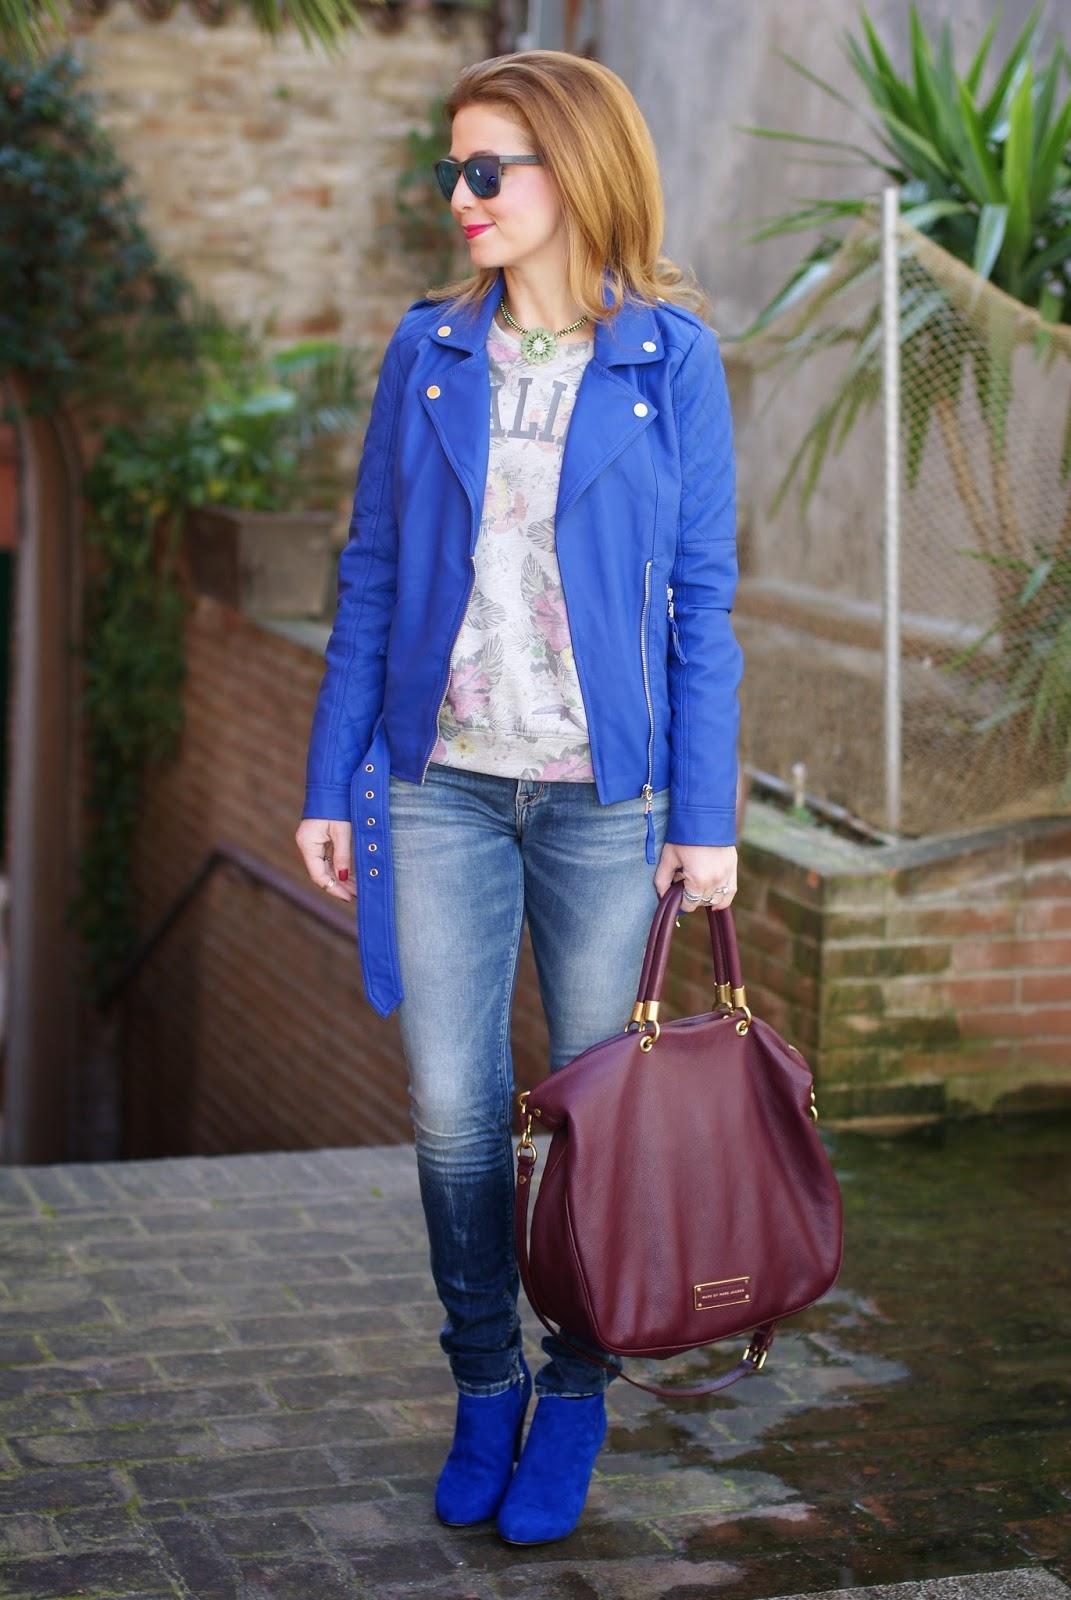 Malibu sweatshirt, Sodini bijoux collana, Oakley blue mirror sunglasses, Fashion and Cookies, fashion blogger